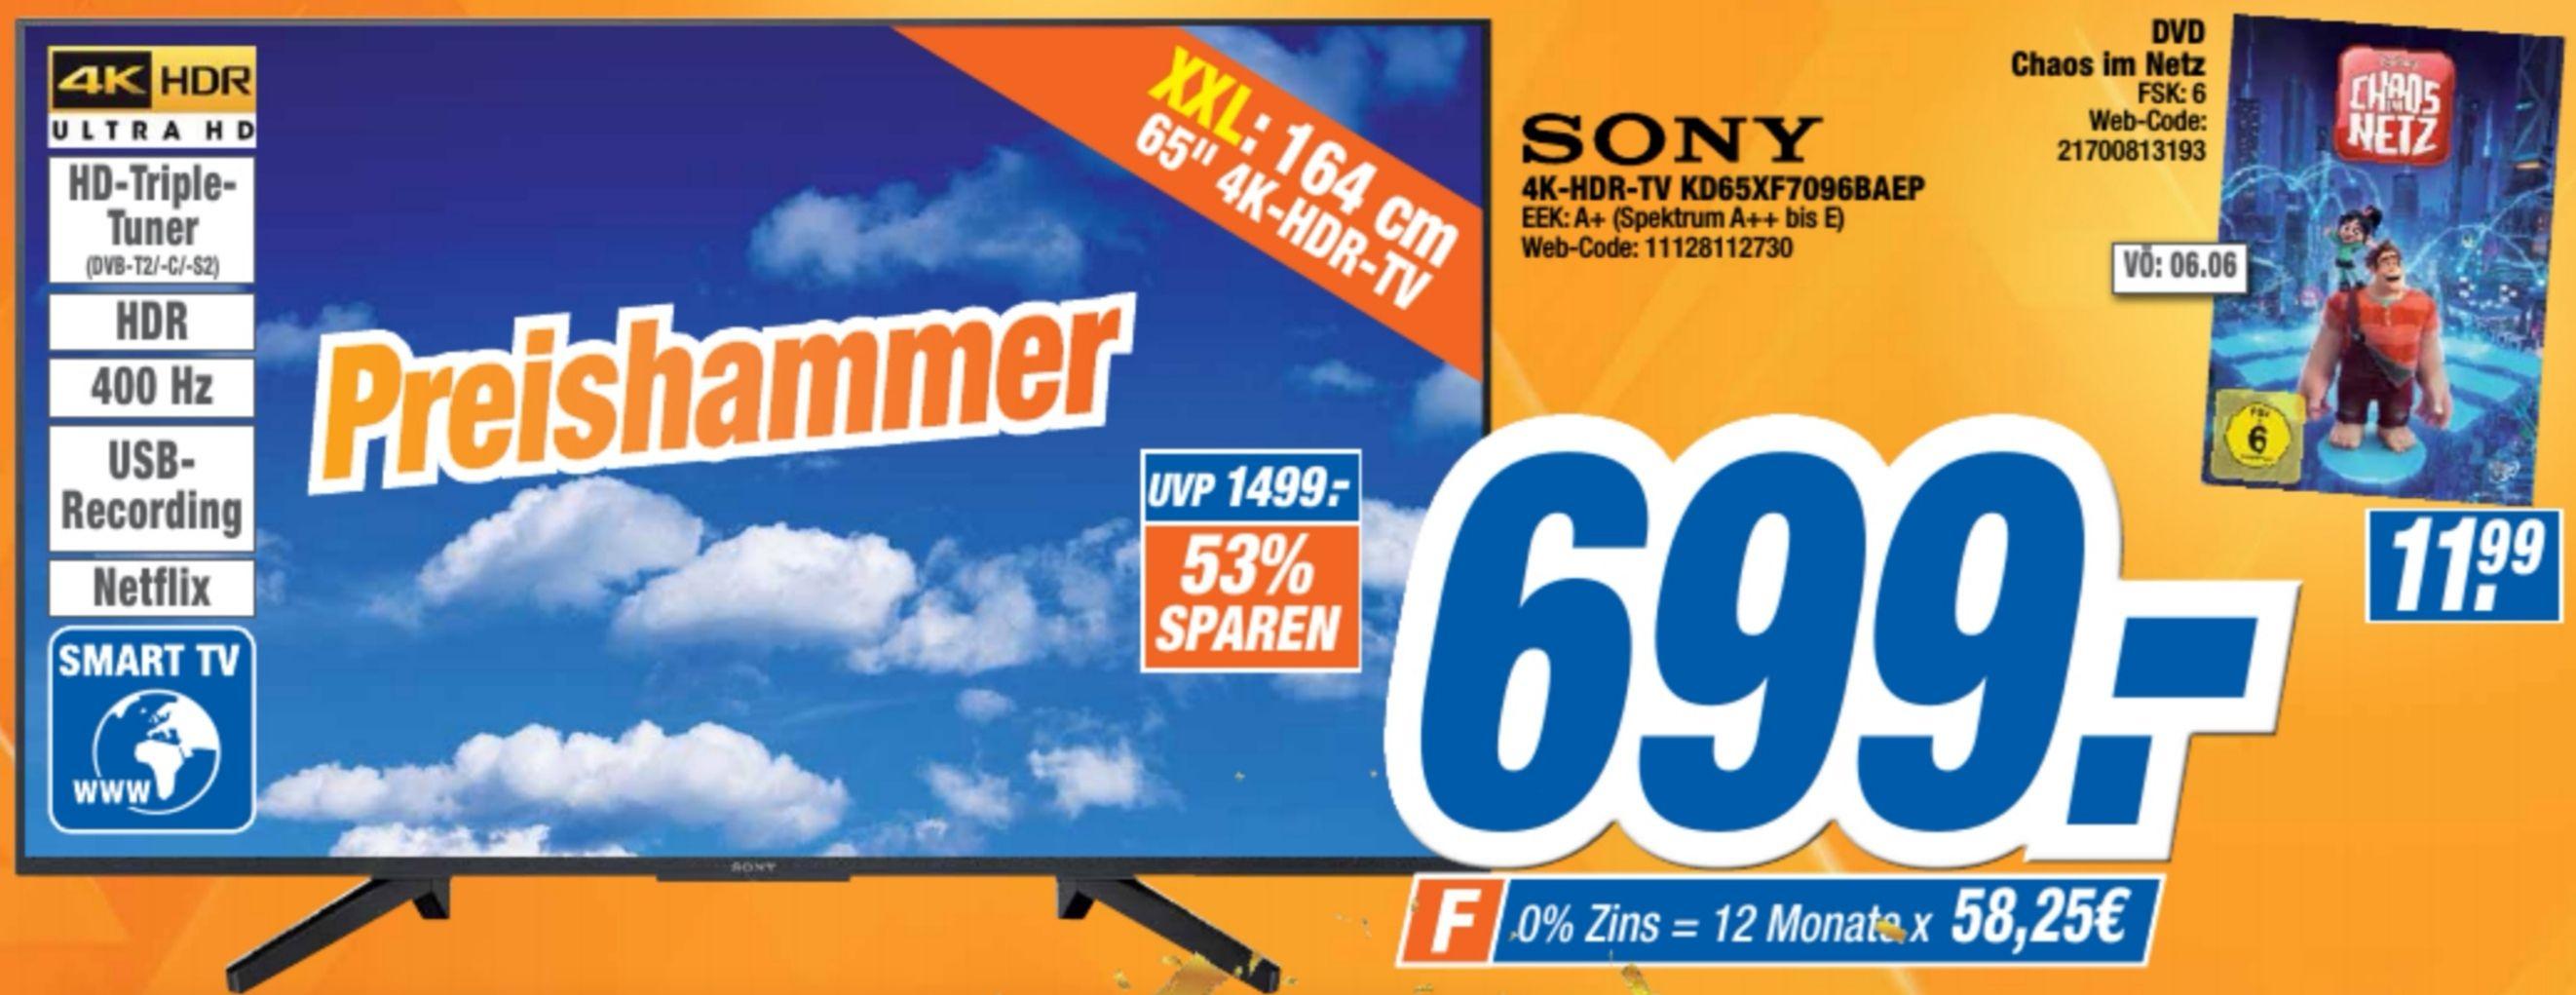 "(Lokal) Sony KD65XF7096BAEP 4K Ultra HD TV (65"", Smart TV, HDR, WLAN, Aufnahmefunktion, HD-Triple-Tuner, DVB-C/S2/T2 HD, 3xHDMI, 3xUSB, CI+"